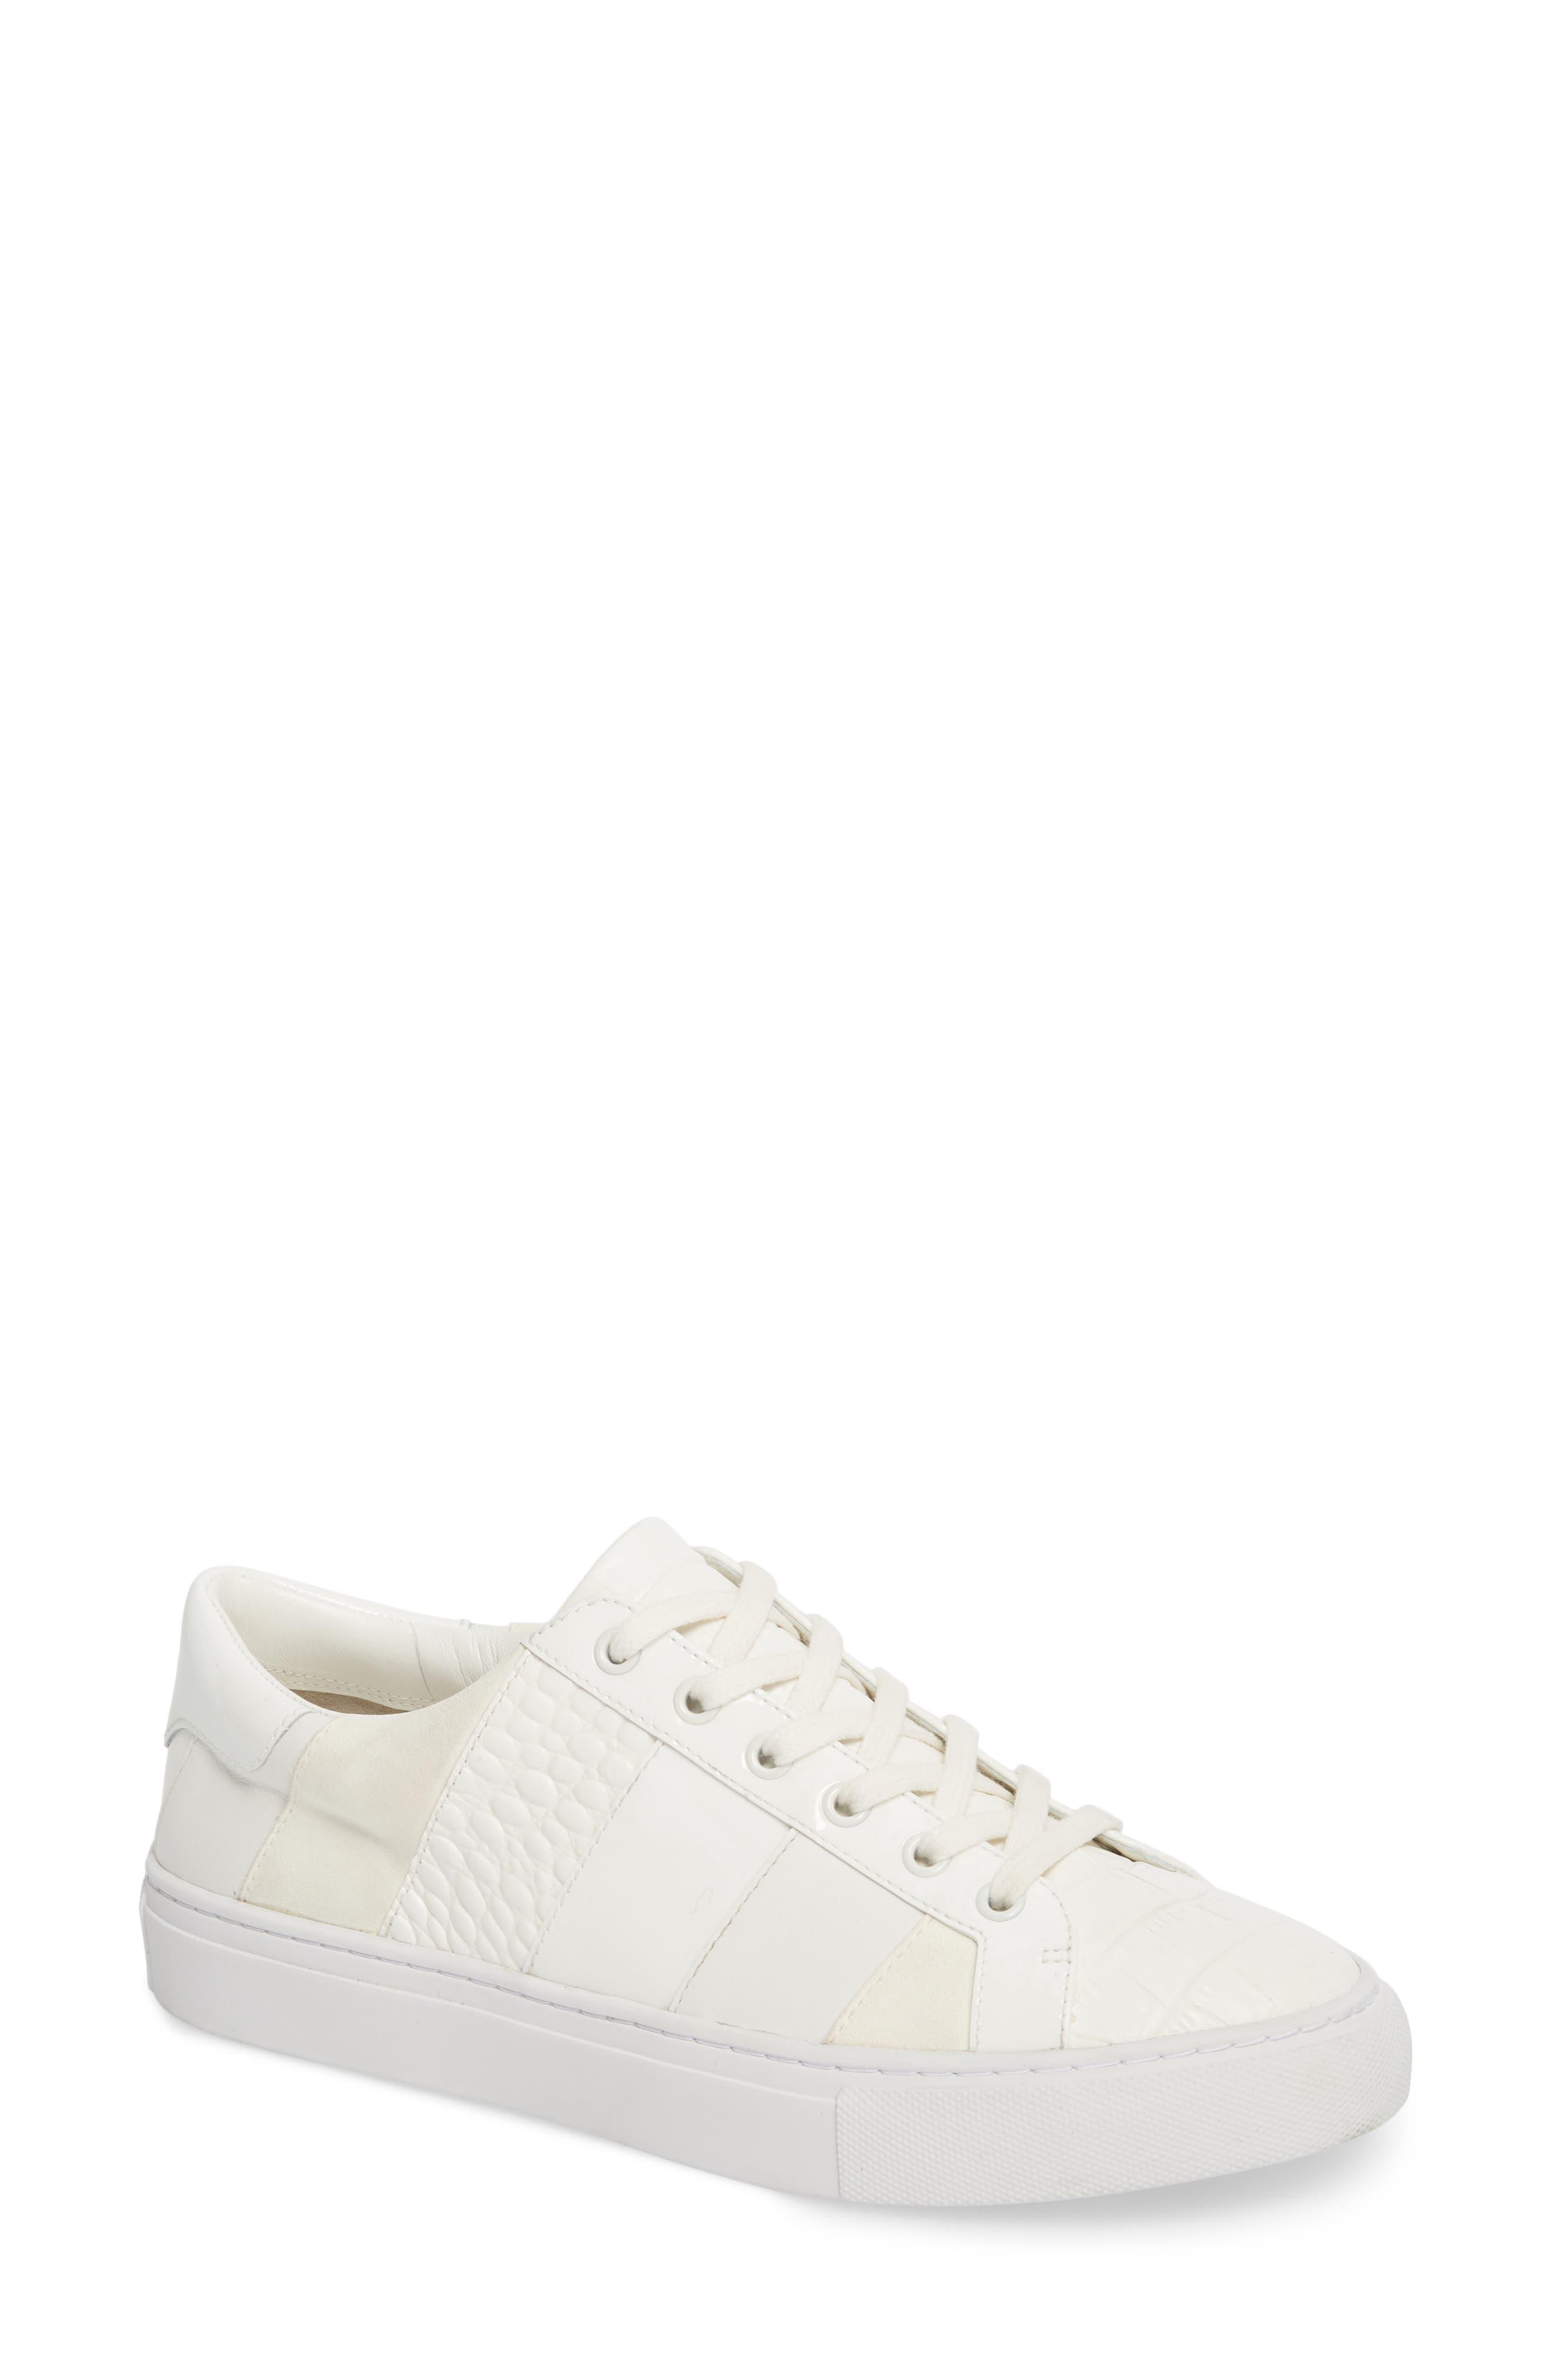 Ames Sneaker,                             Main thumbnail 1, color,                             SNOW WHITE